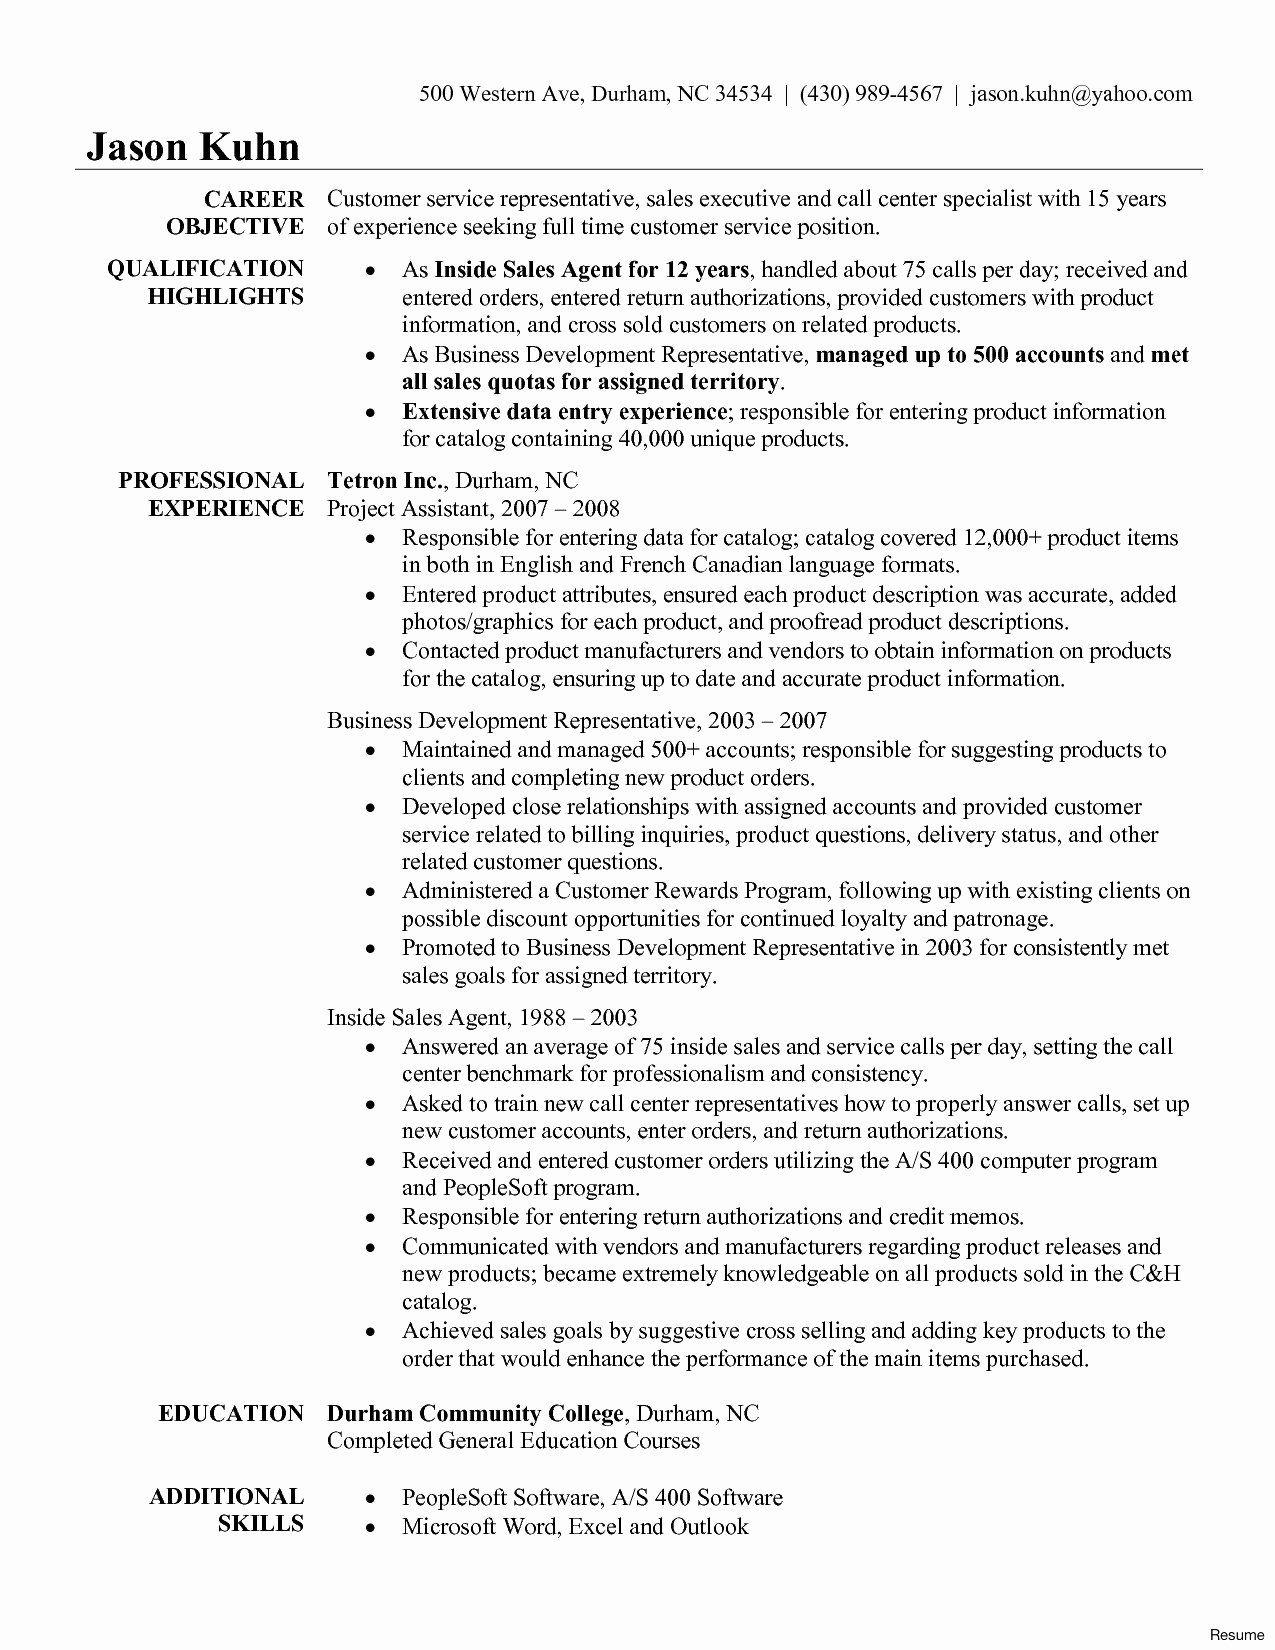 financial service representative resume unique 11 12 free creative templates microsoft word good opening statement internship examples 2018